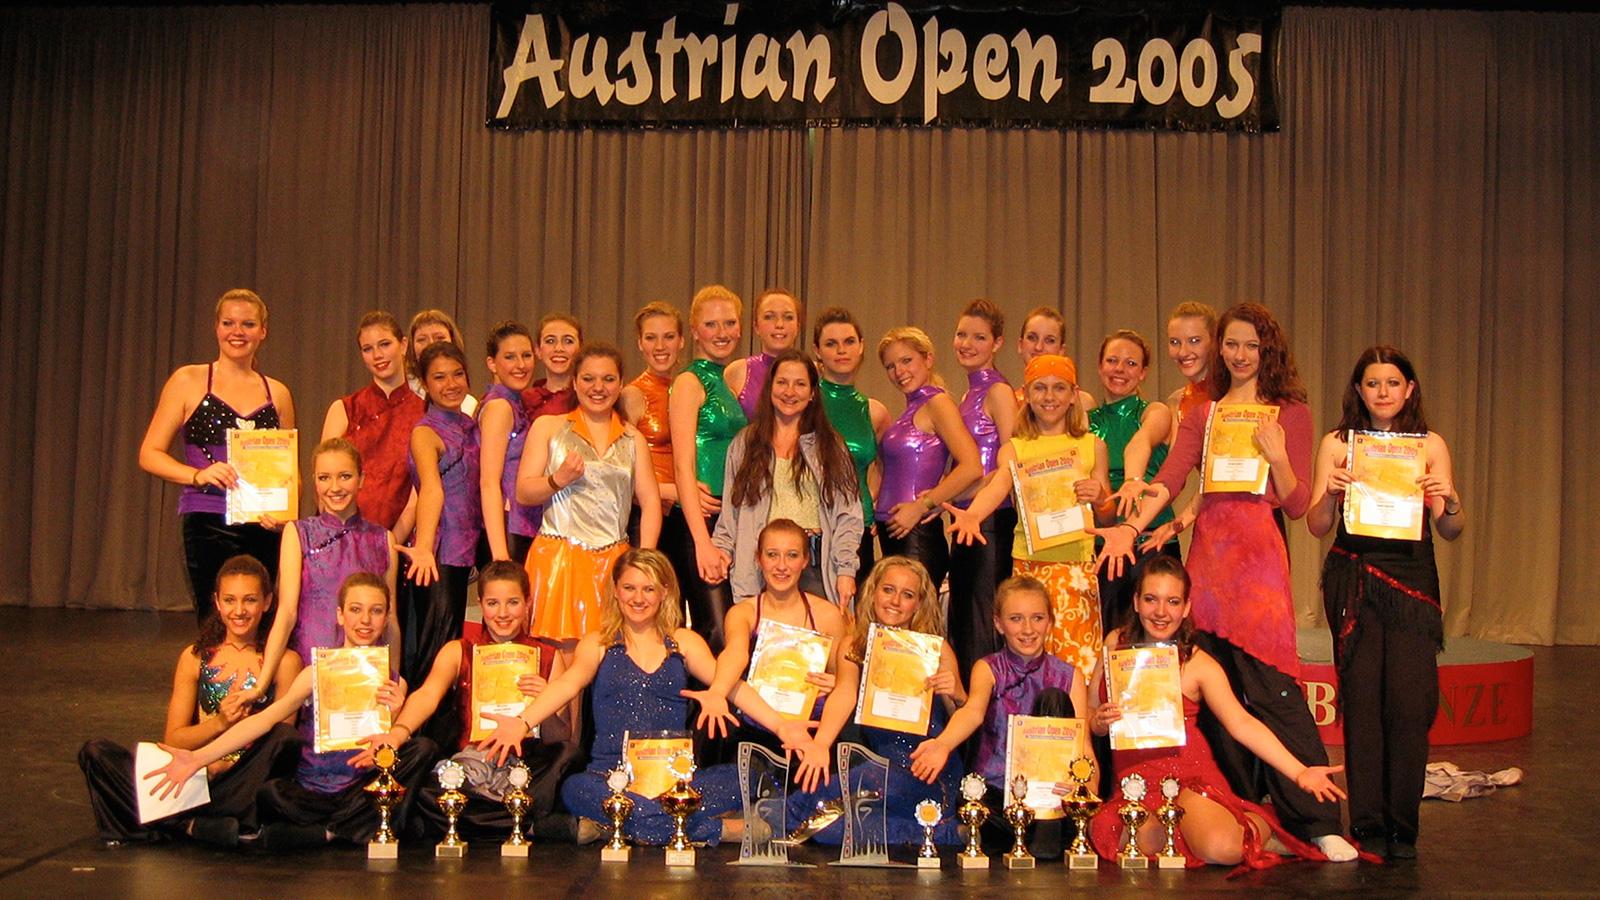 Austrian Open 2005